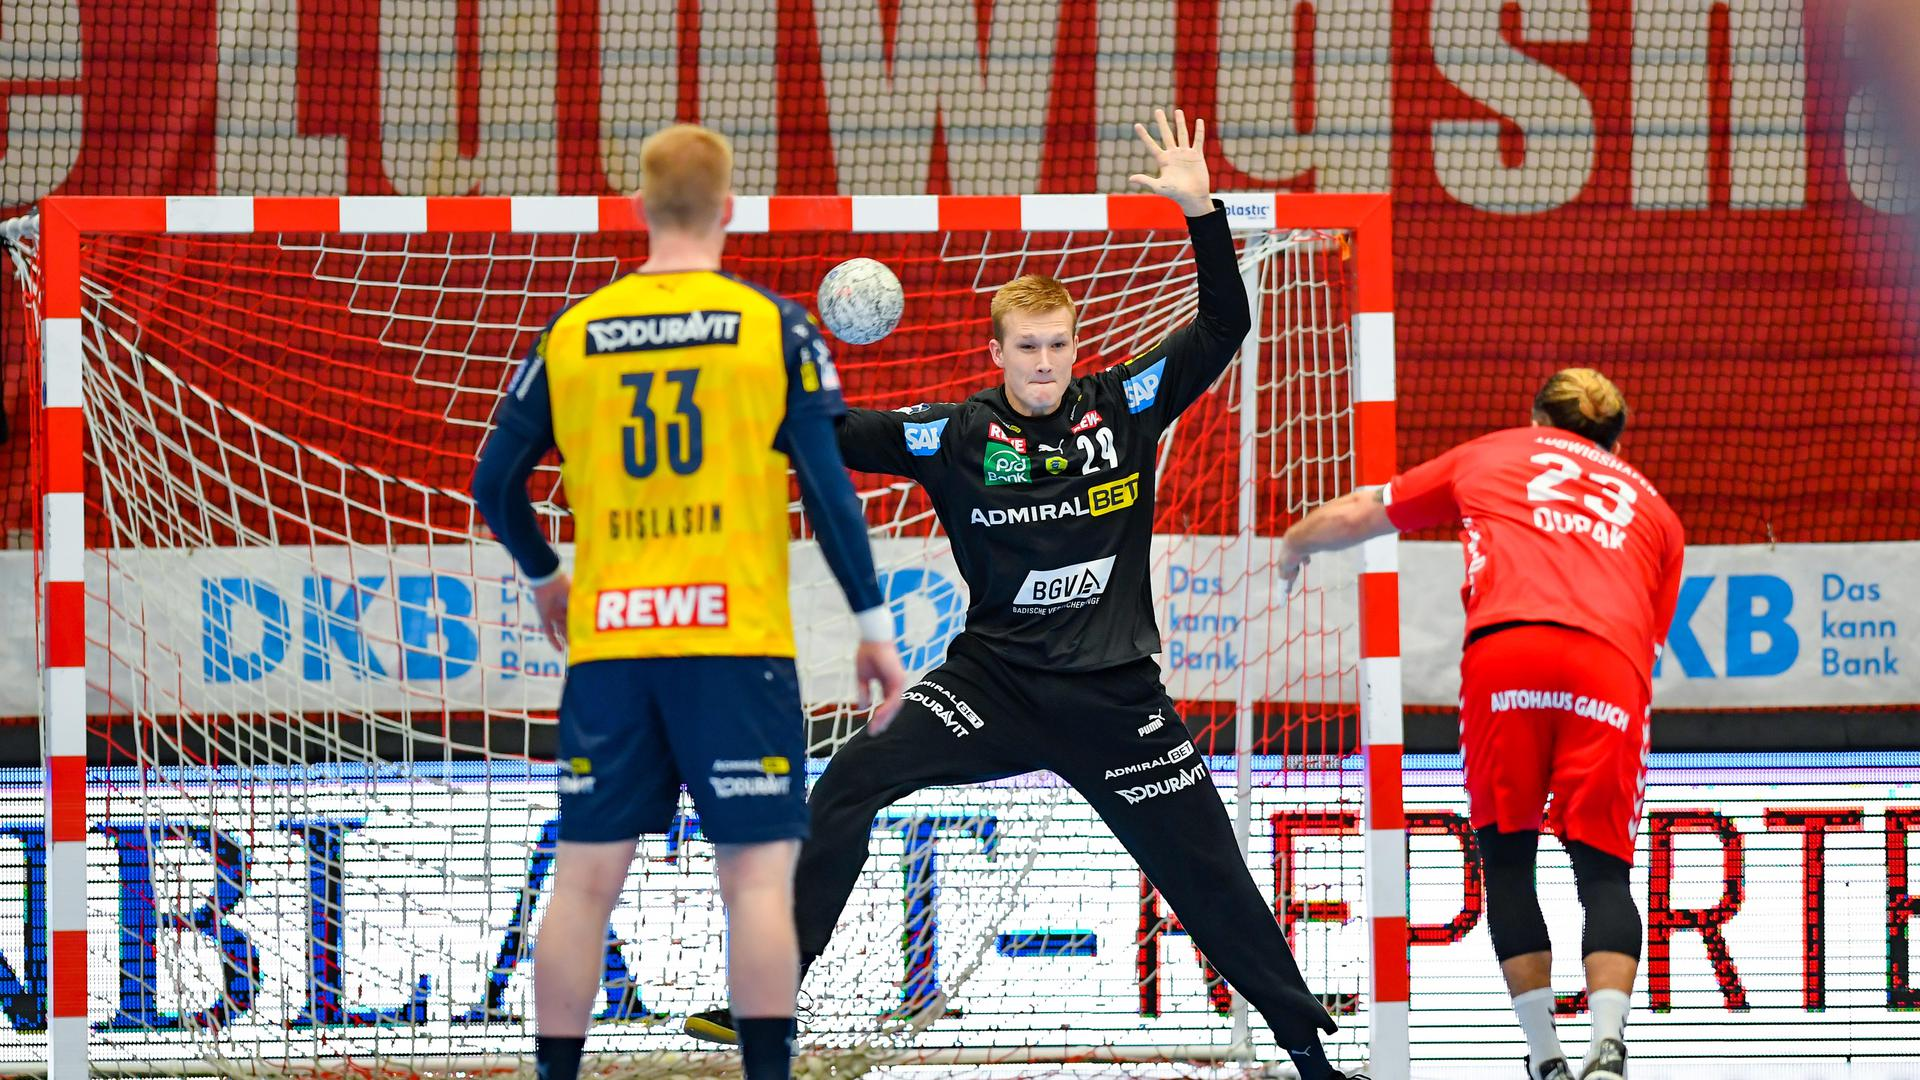 David Spaeth #29 / RNL  haelt gegen Pascal Durak       , Eulen Ludwigshafen vs. Rhein-Neckar Loewen  , RNL Saison 2020 / 2021,  © Copyright: AS Sportfoto / Soerli Binder,  www. as-sportfoto.de, MSP_0610_RNL_